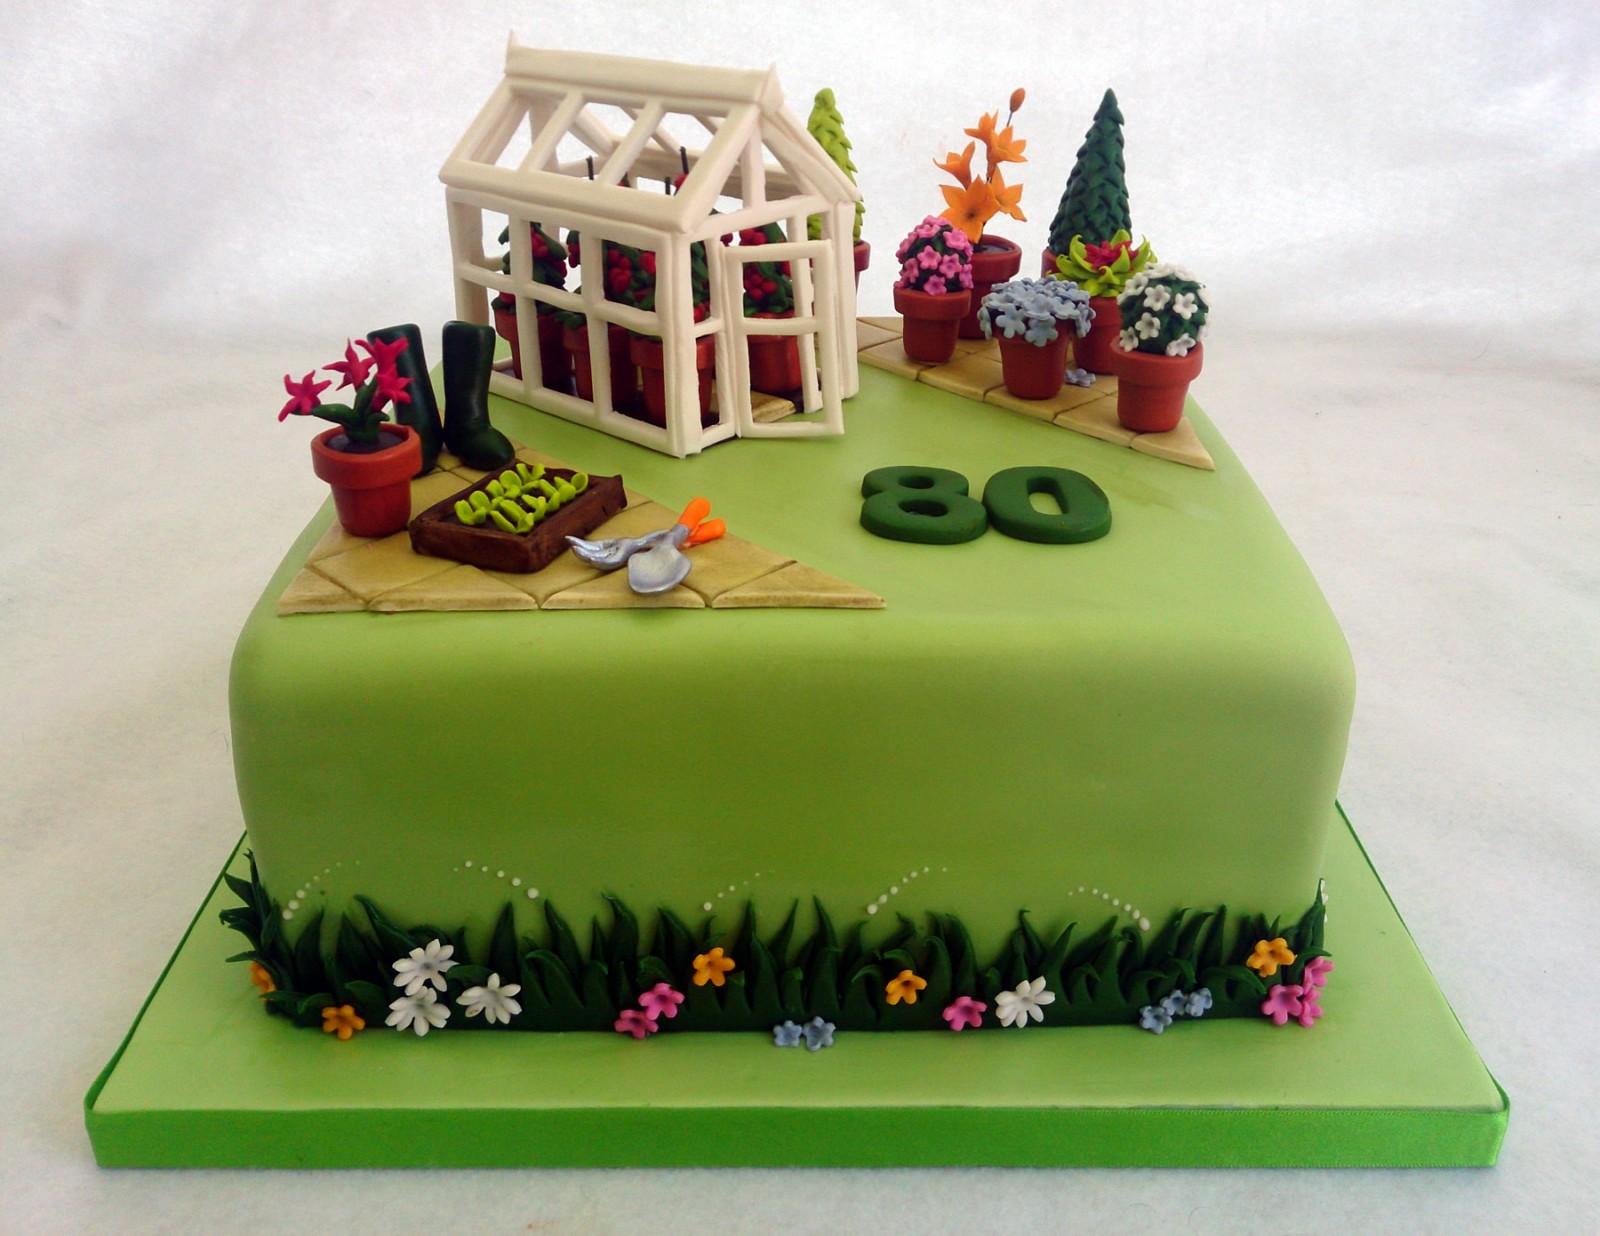 Greenhouse With Tomato Plants Gardeners Birthday Cake Susies Cakes